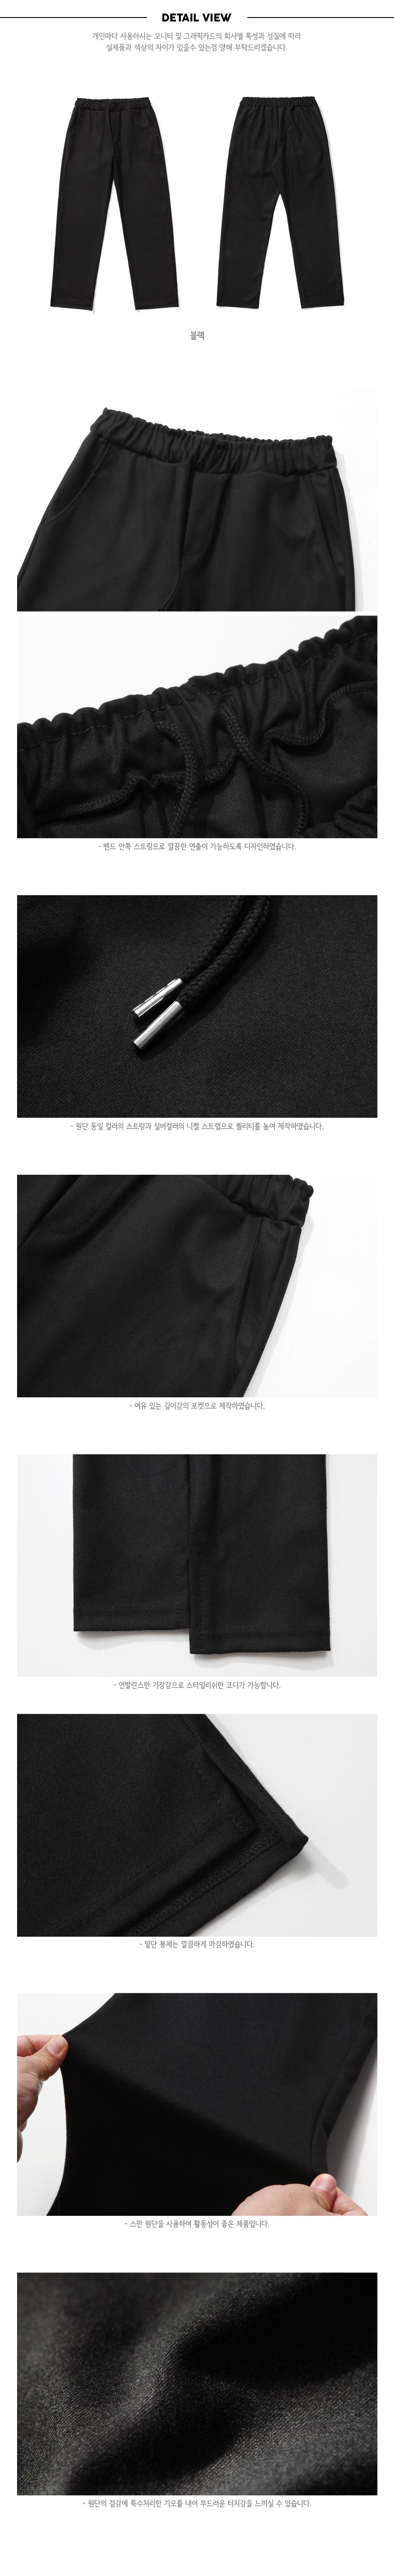 20180820_unbal_slacks_detail_black_kj.jpg